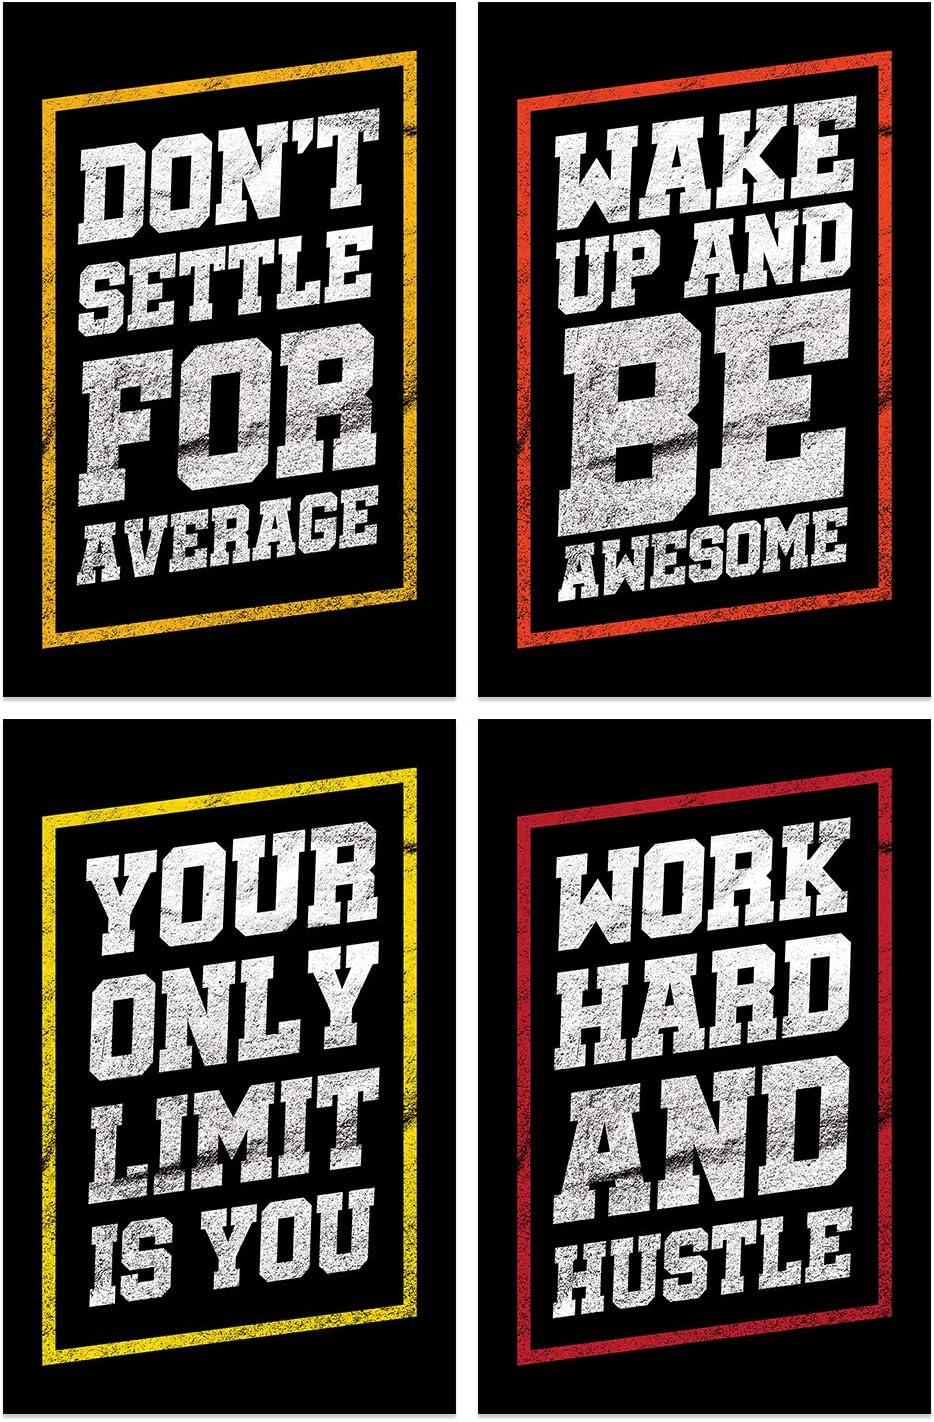 Damdekoli Inspirational Posters, 11x17 Inches, Set